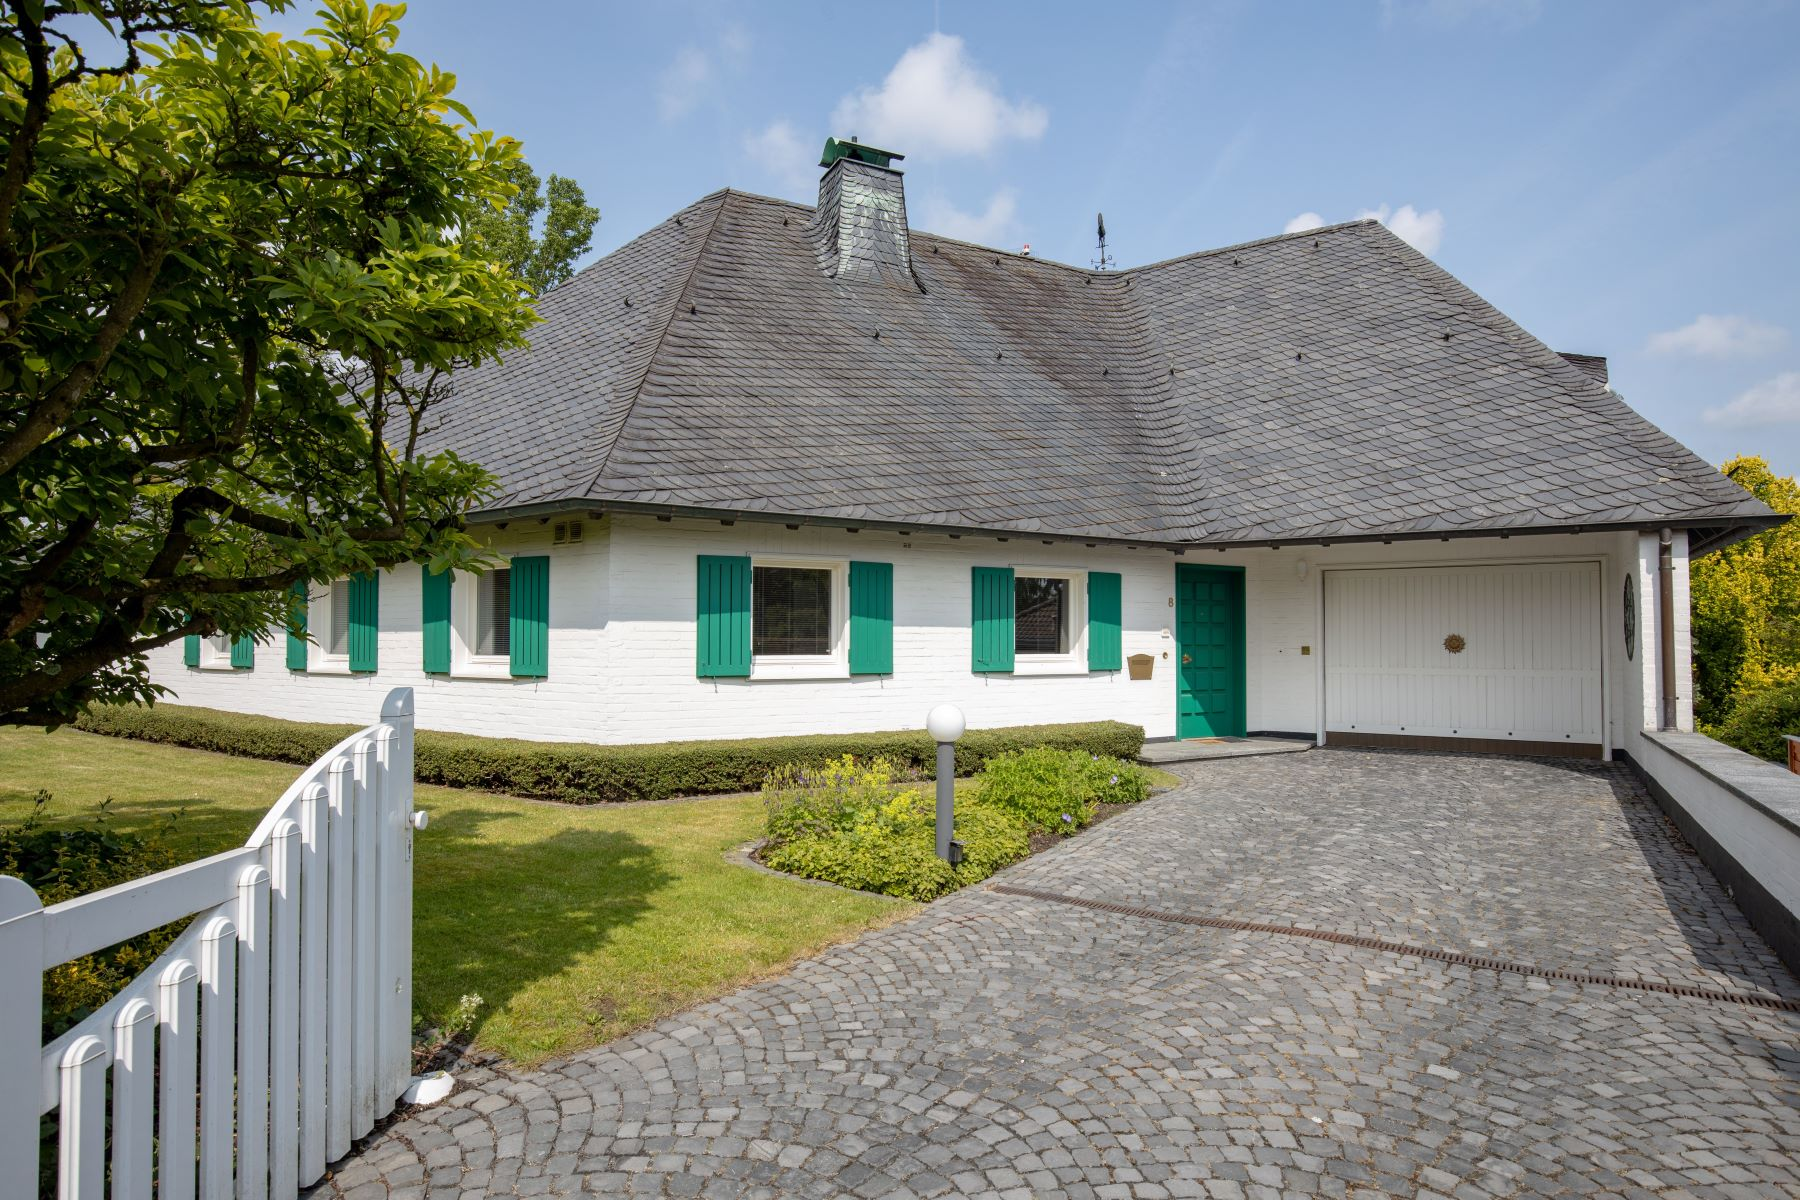 Single Family Homes for Sale at Representative Country Villa Other North Rhine Westphalia, North Rhine Westphalia 51399 Germany